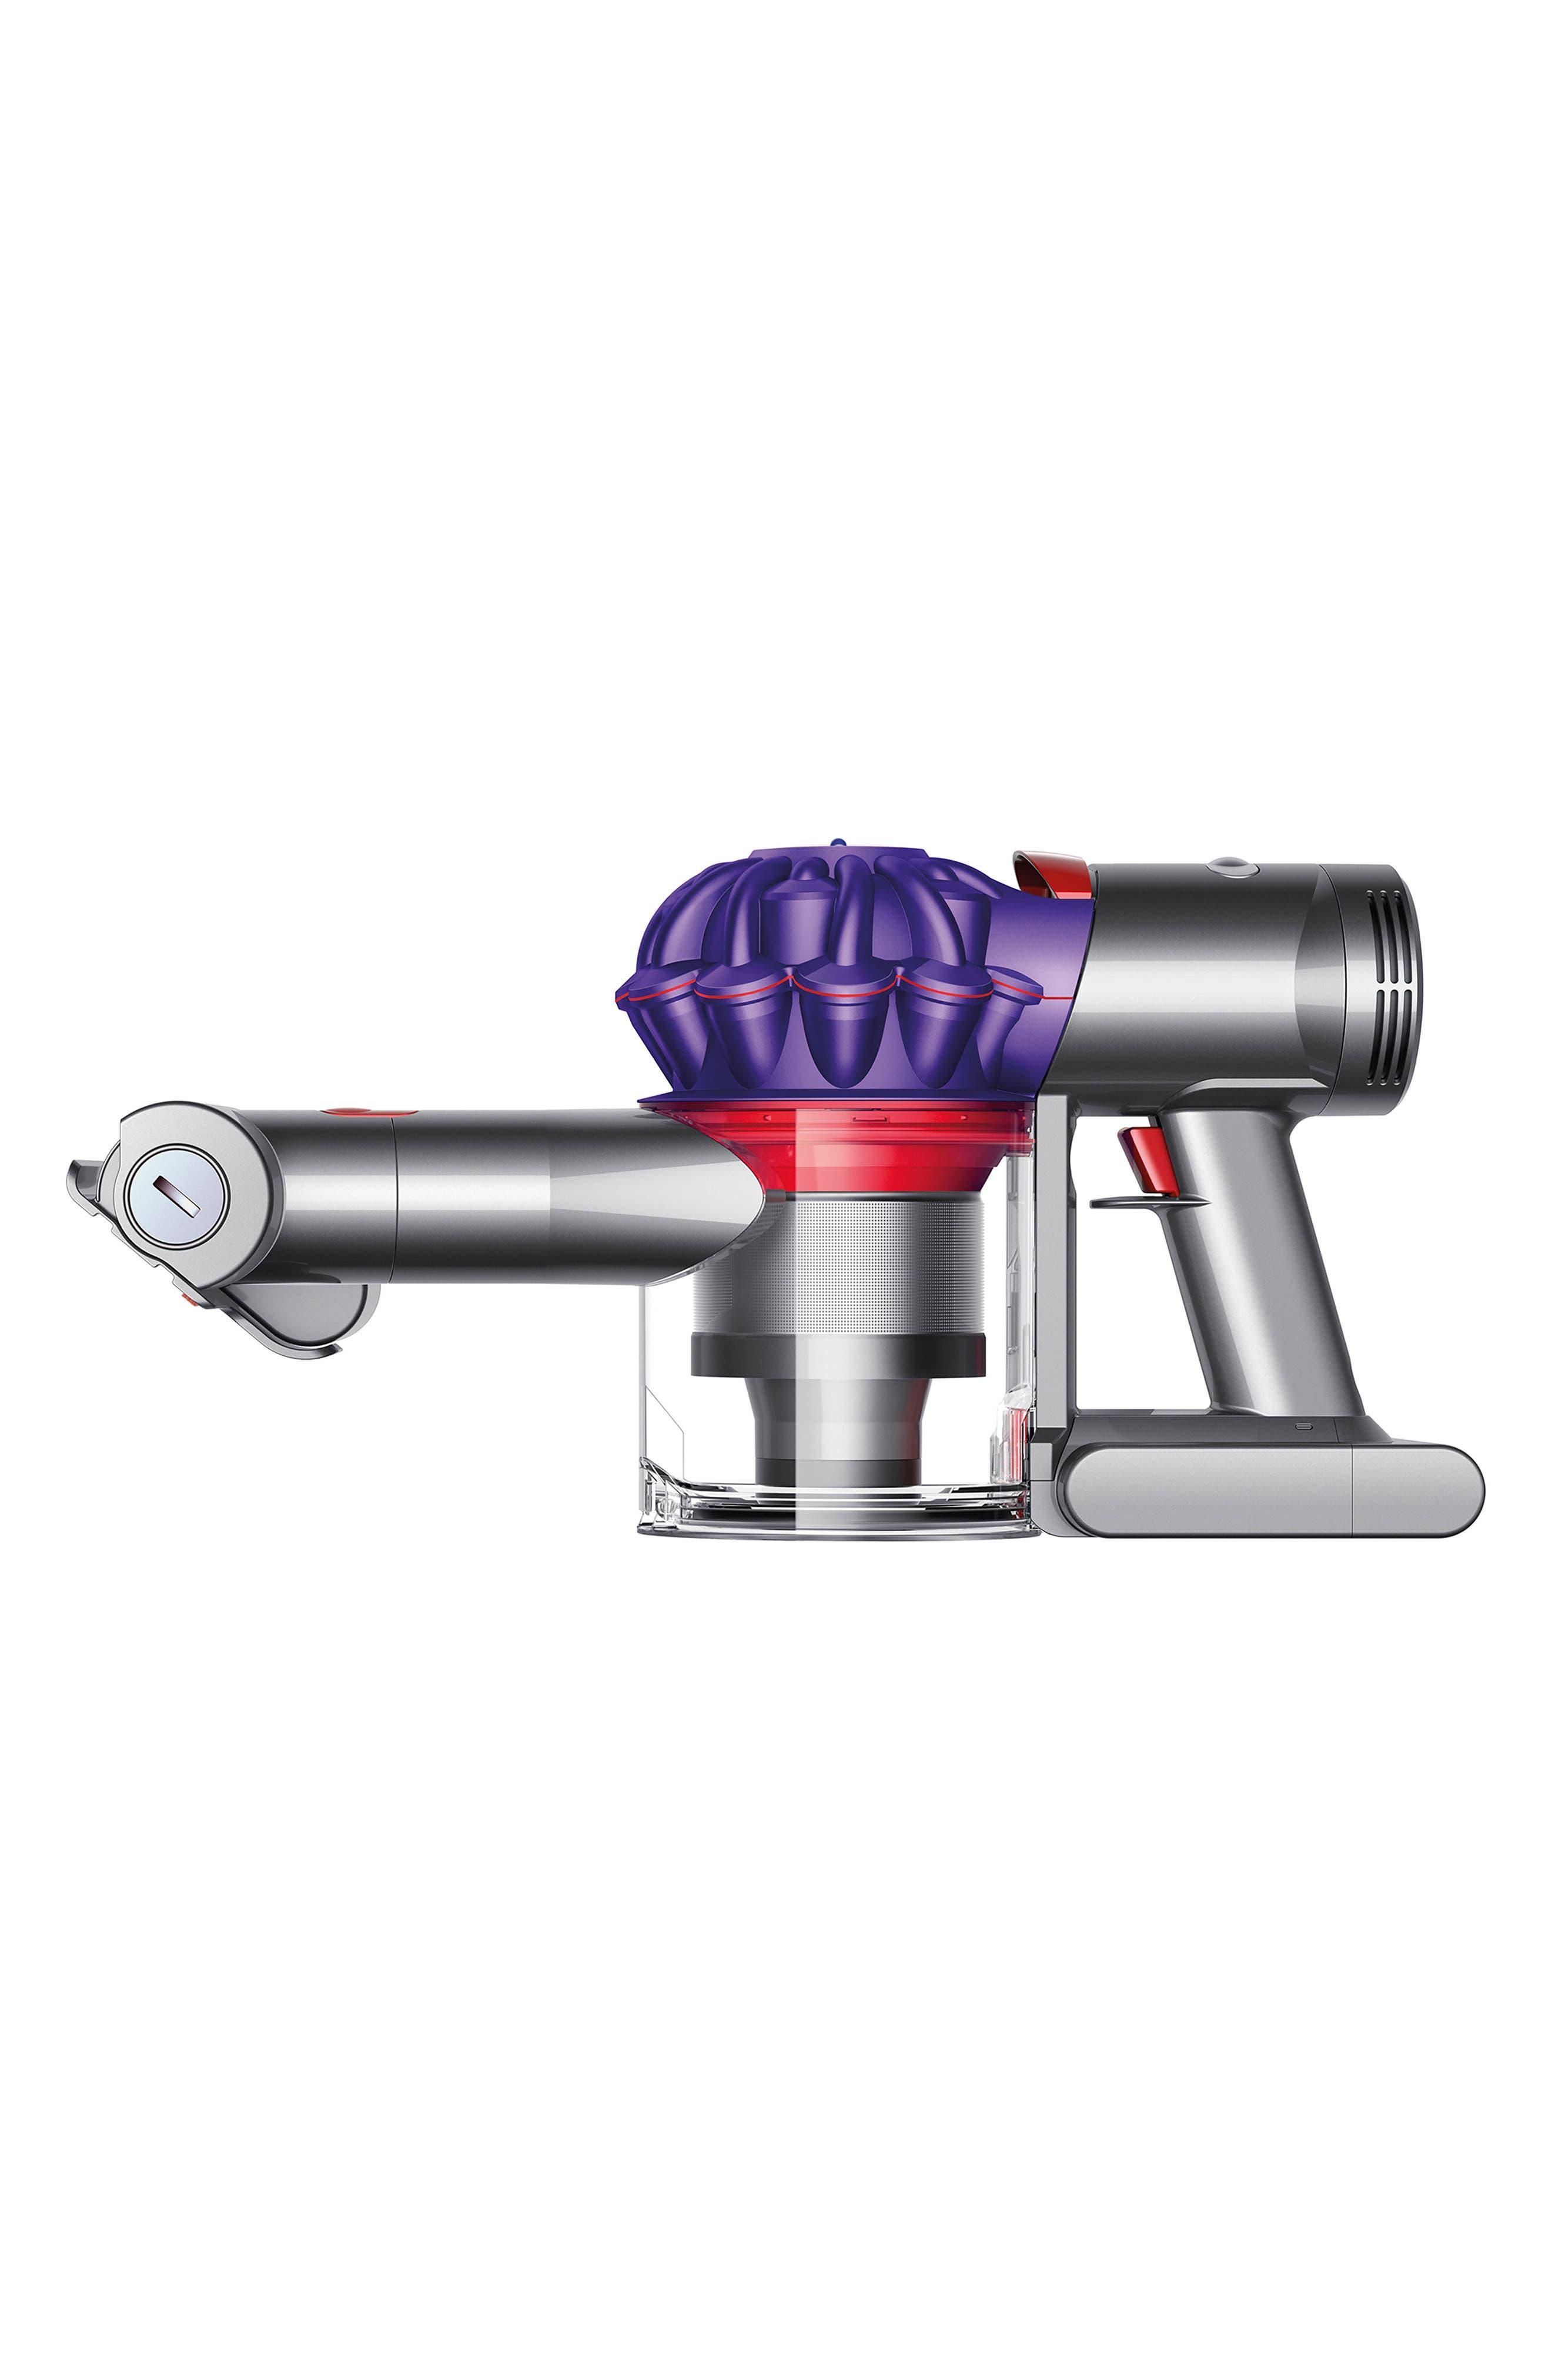 Alternate Image 1 Selected - Dyson V7 Car & Boat Cordless Handheld Vacuum